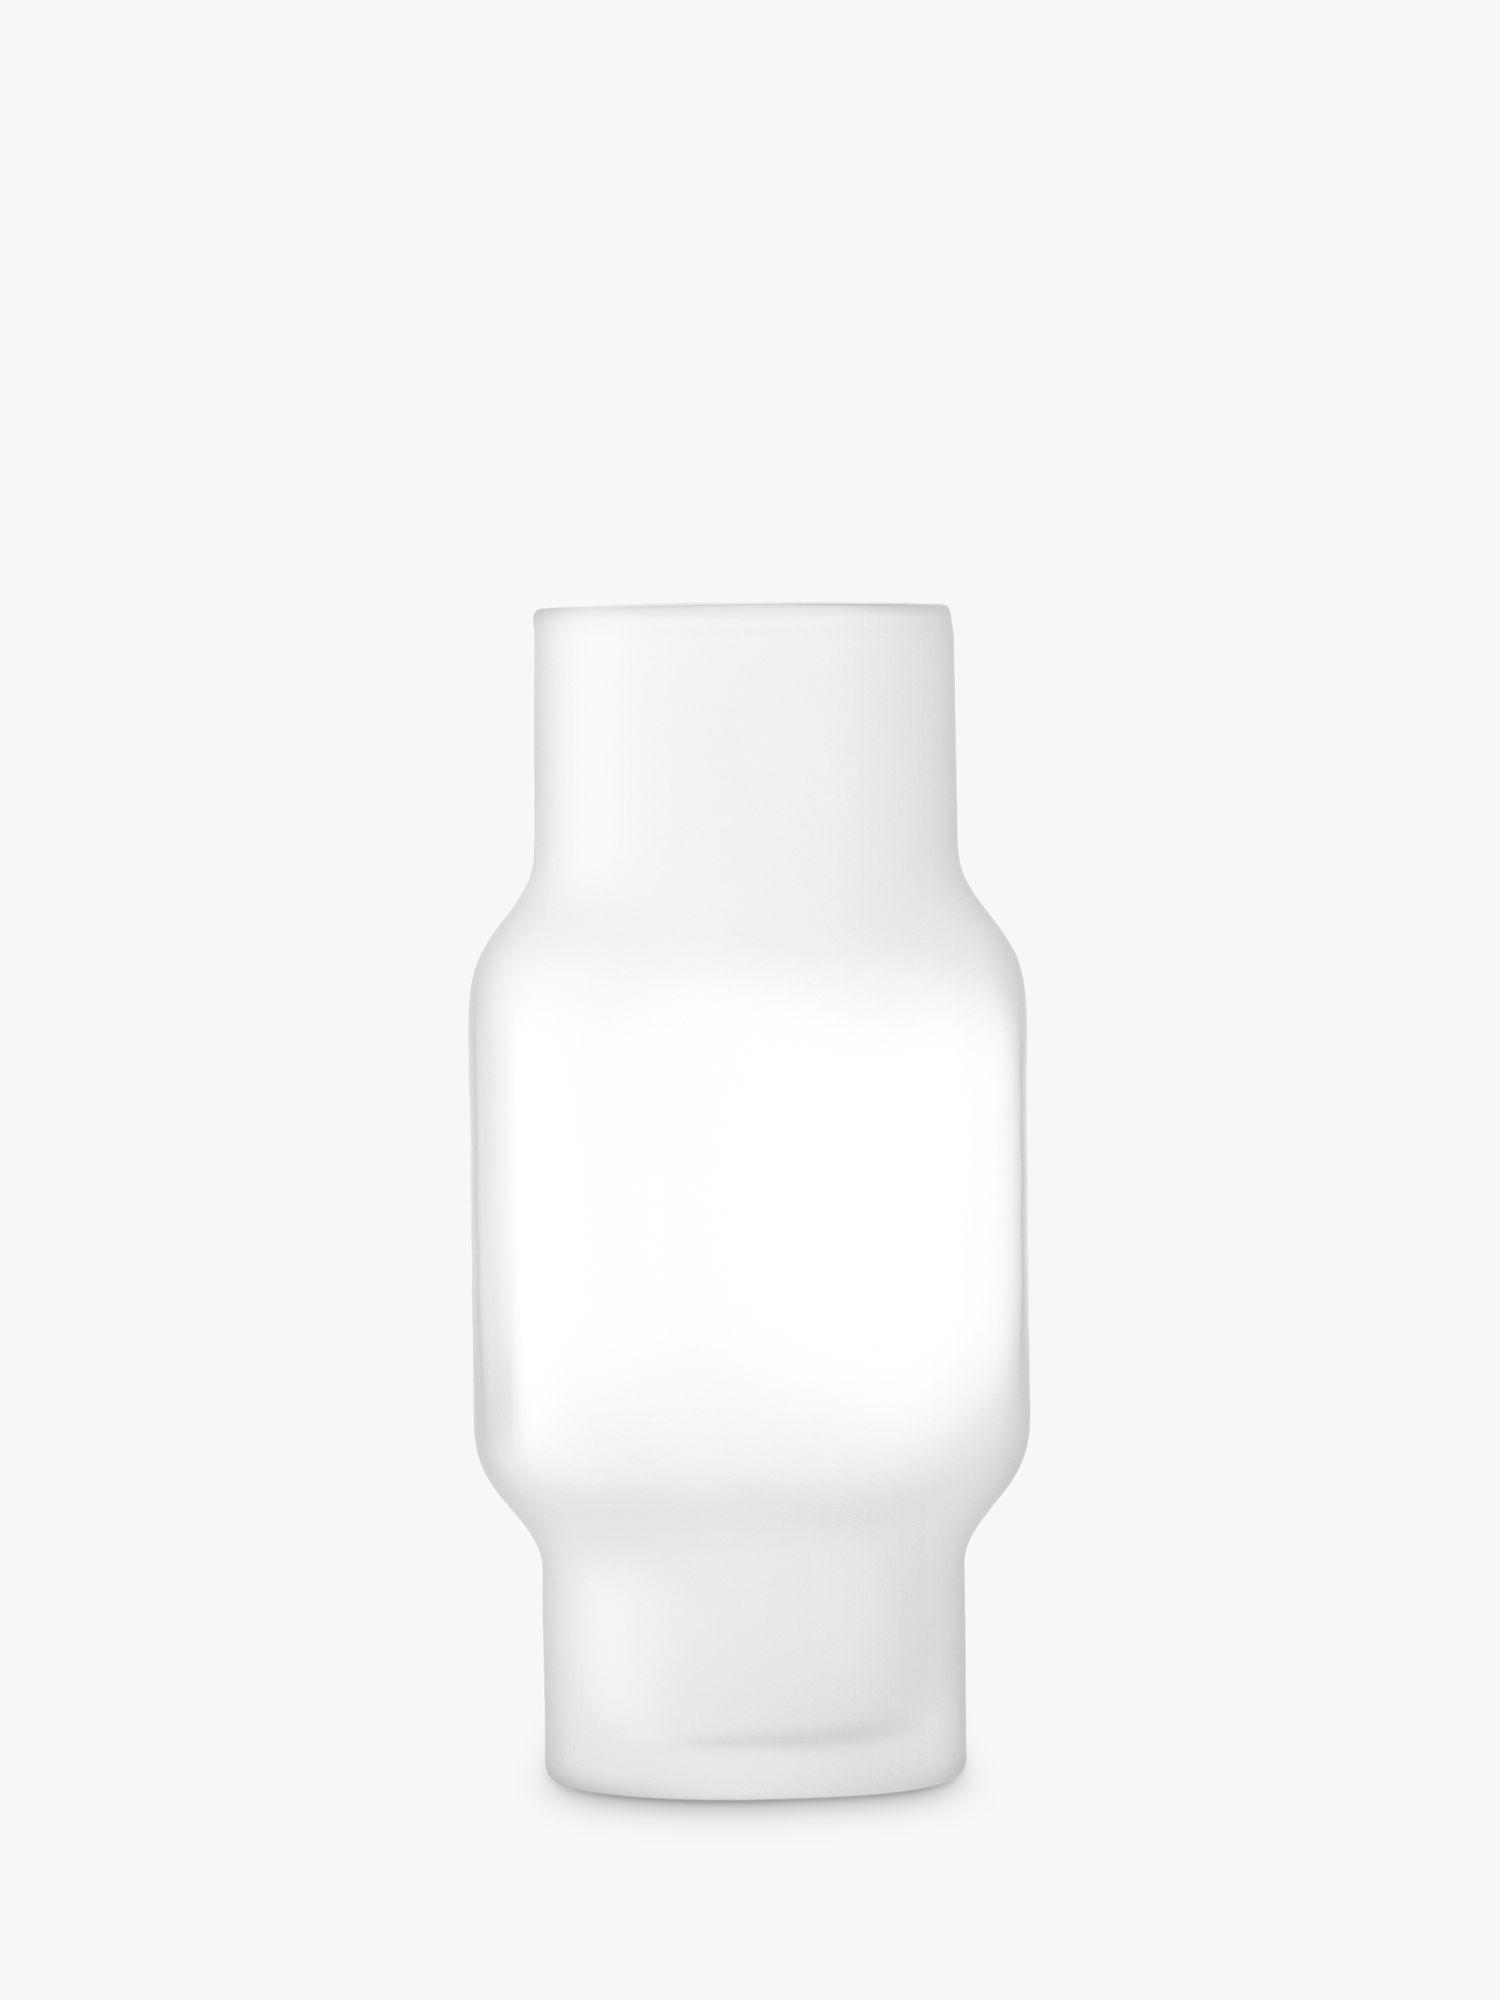 LSA International LSA International Mist Vase, H30cm